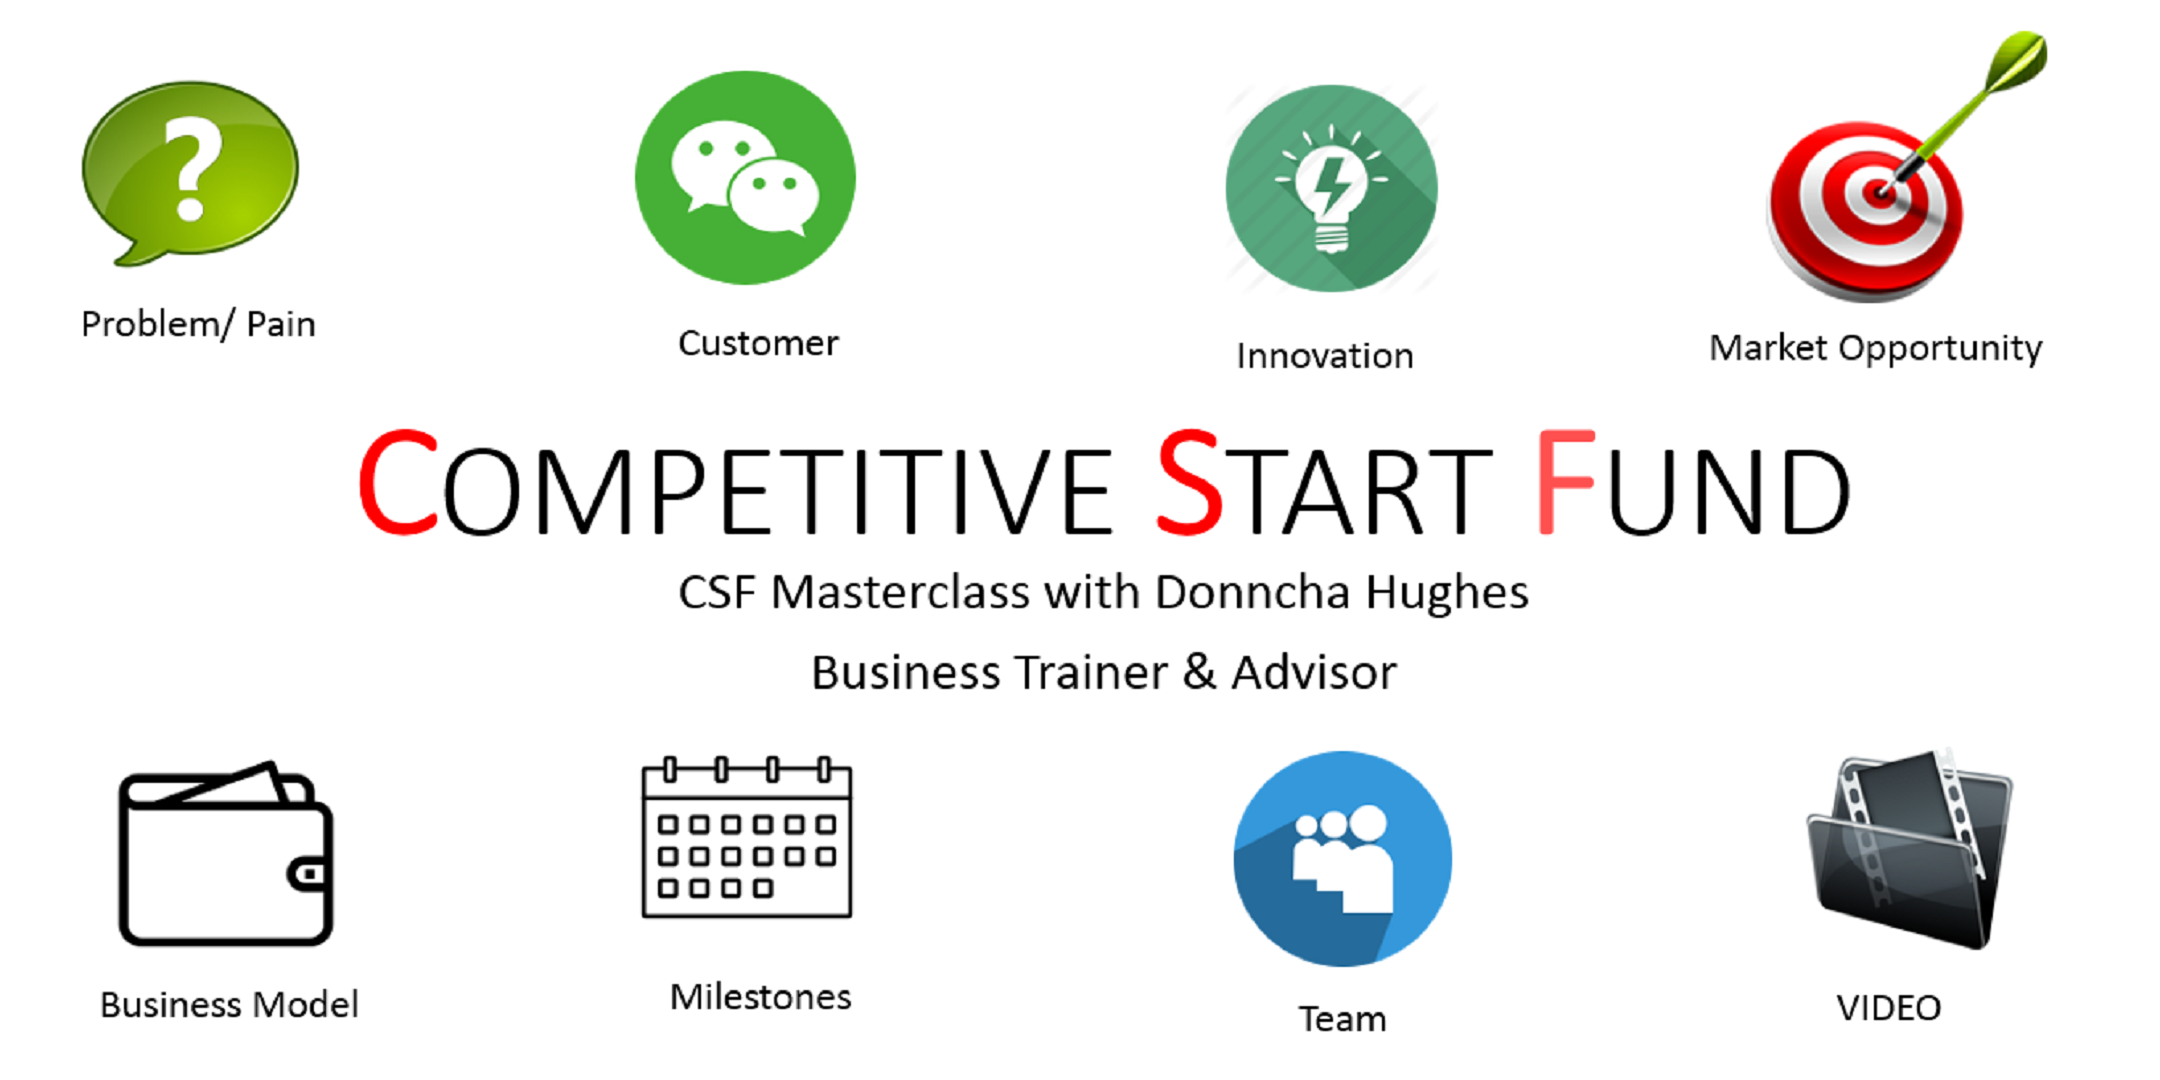 Competitive Start Fund Masterclass